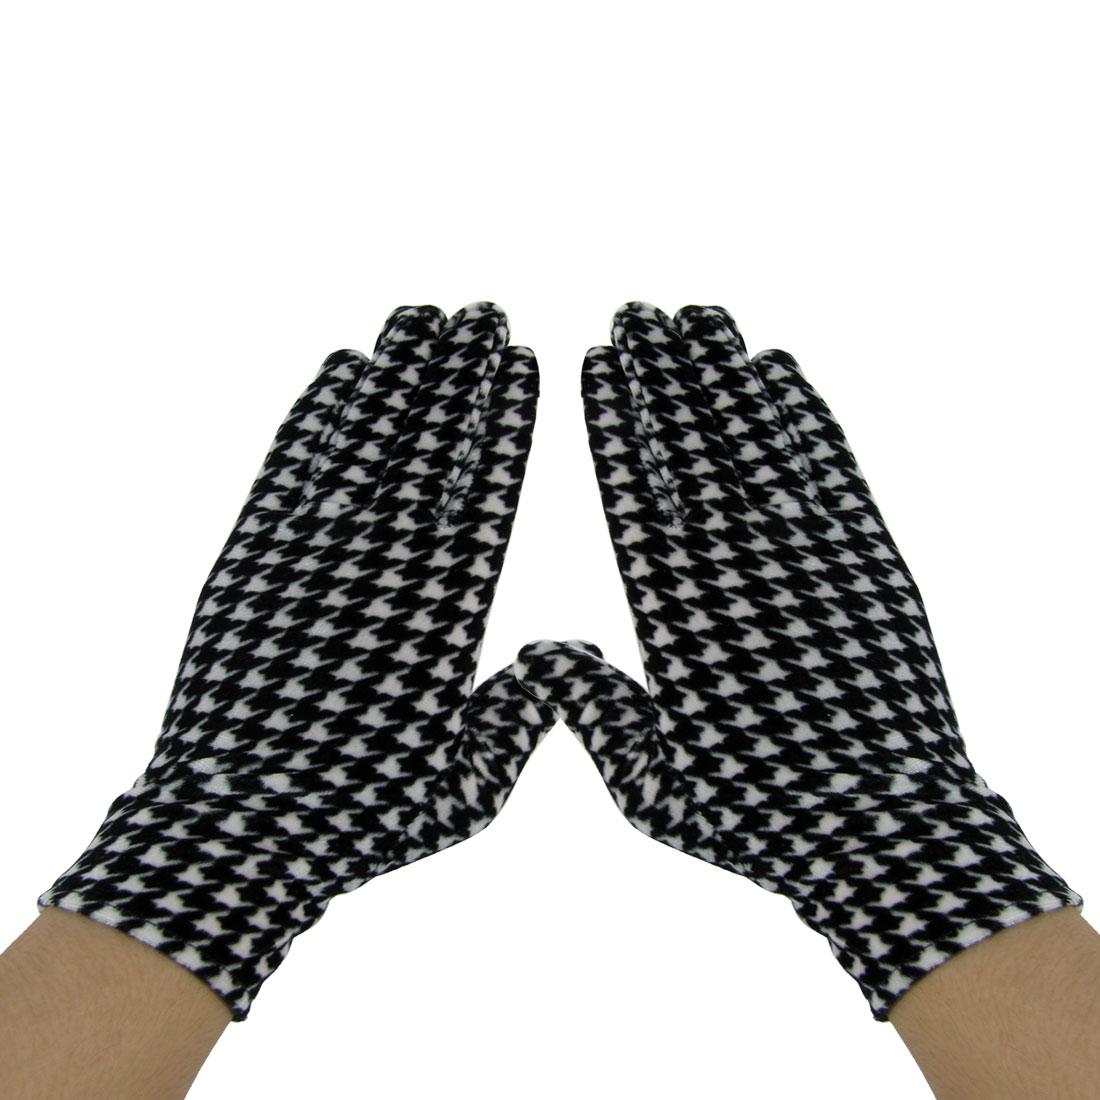 Ladies Pair Houndstooth Printed Full Fingers Warm Gloves Black White